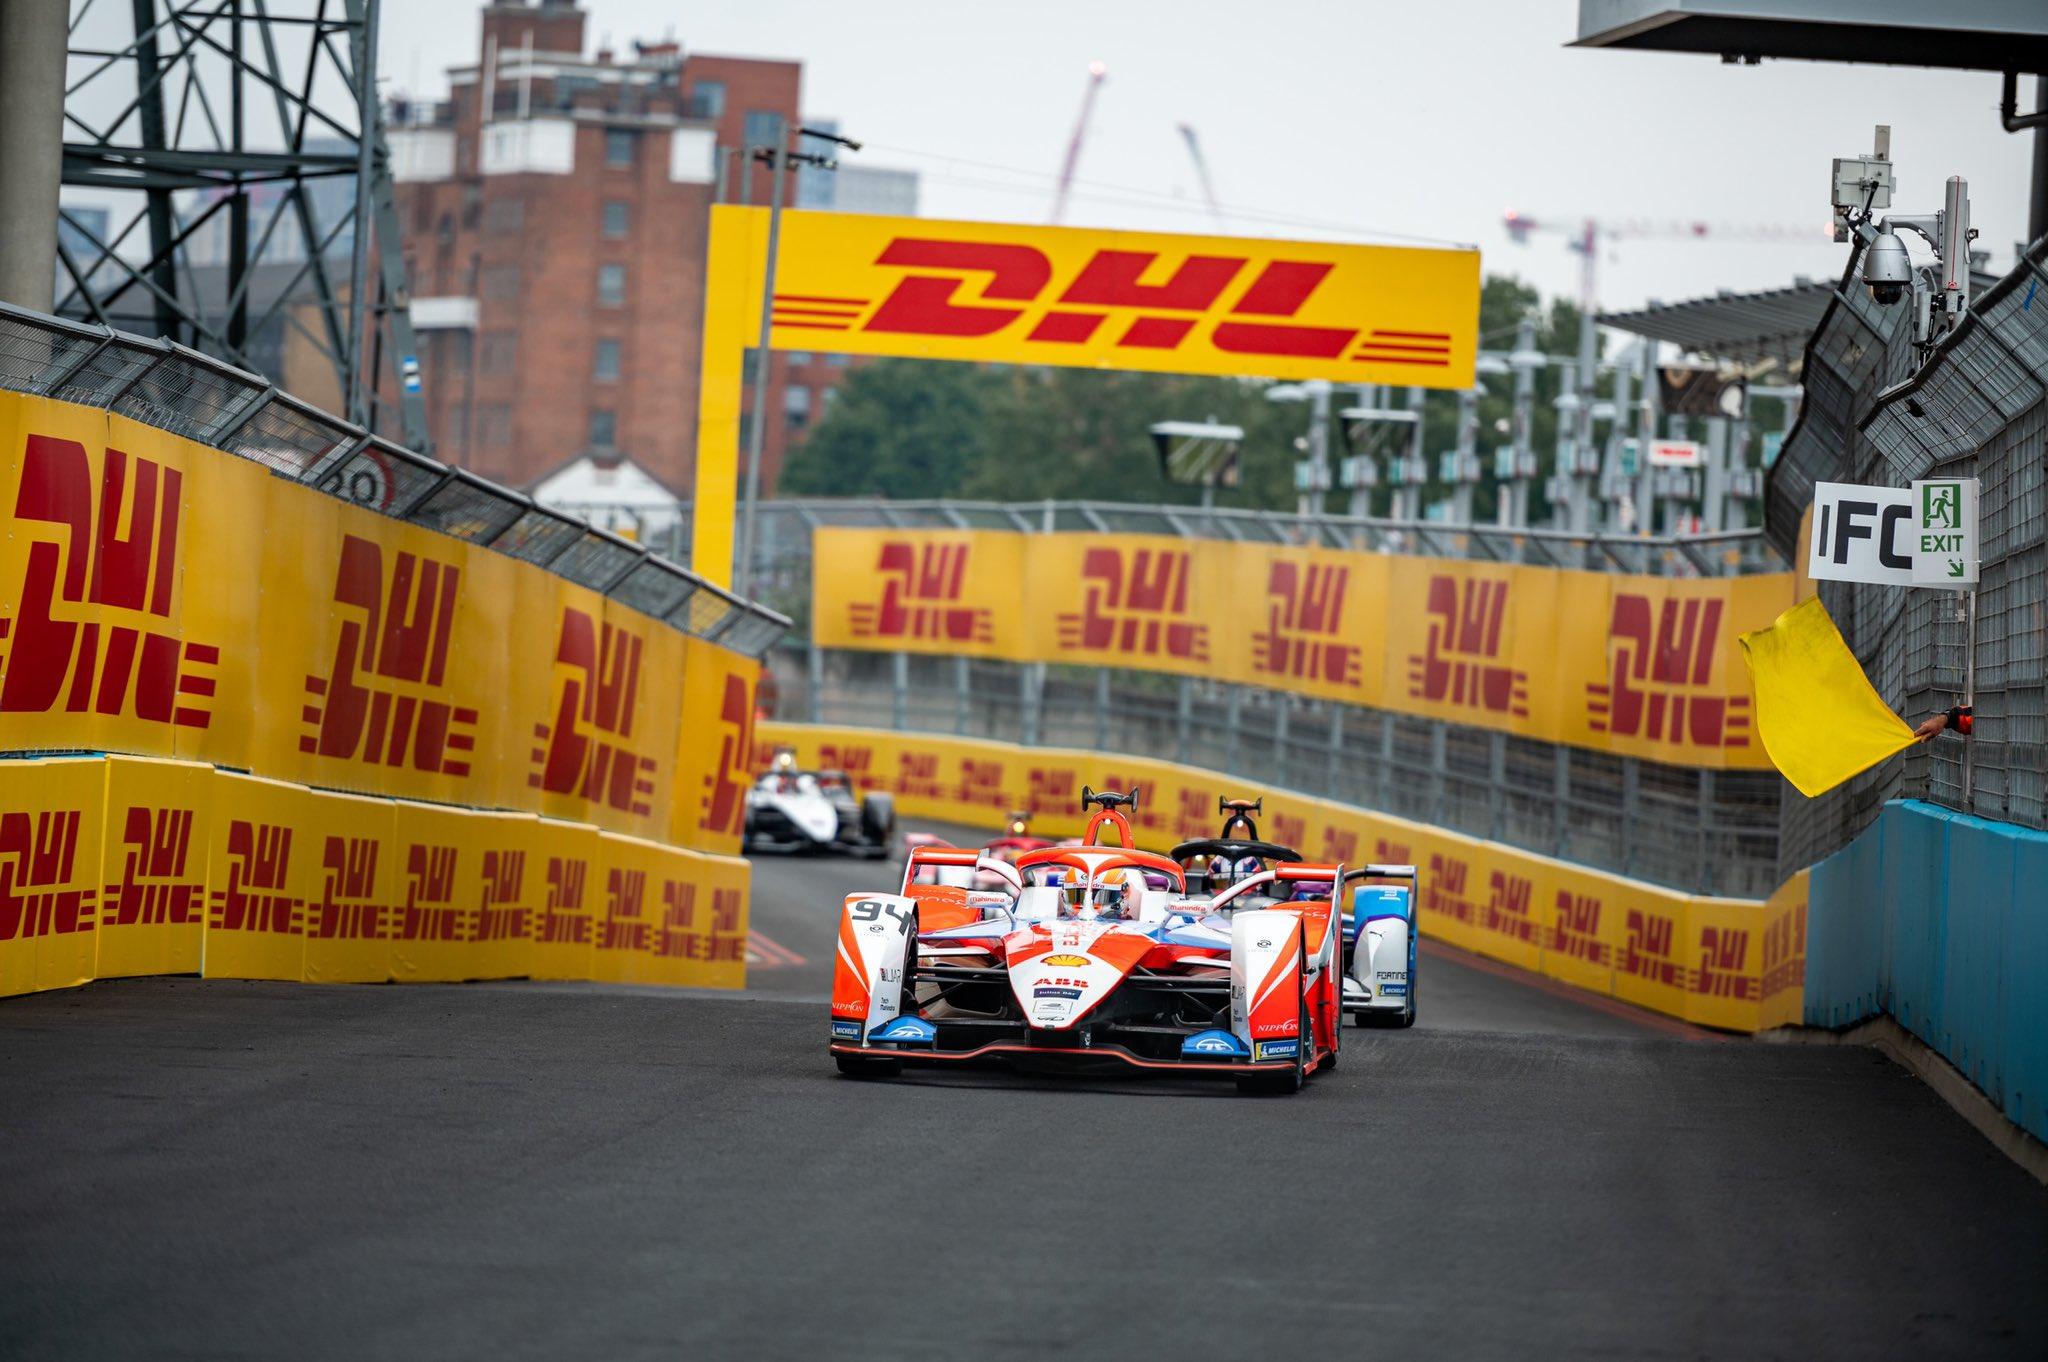 Alex Lynn - Mahindra Racing - Formule E - Londen